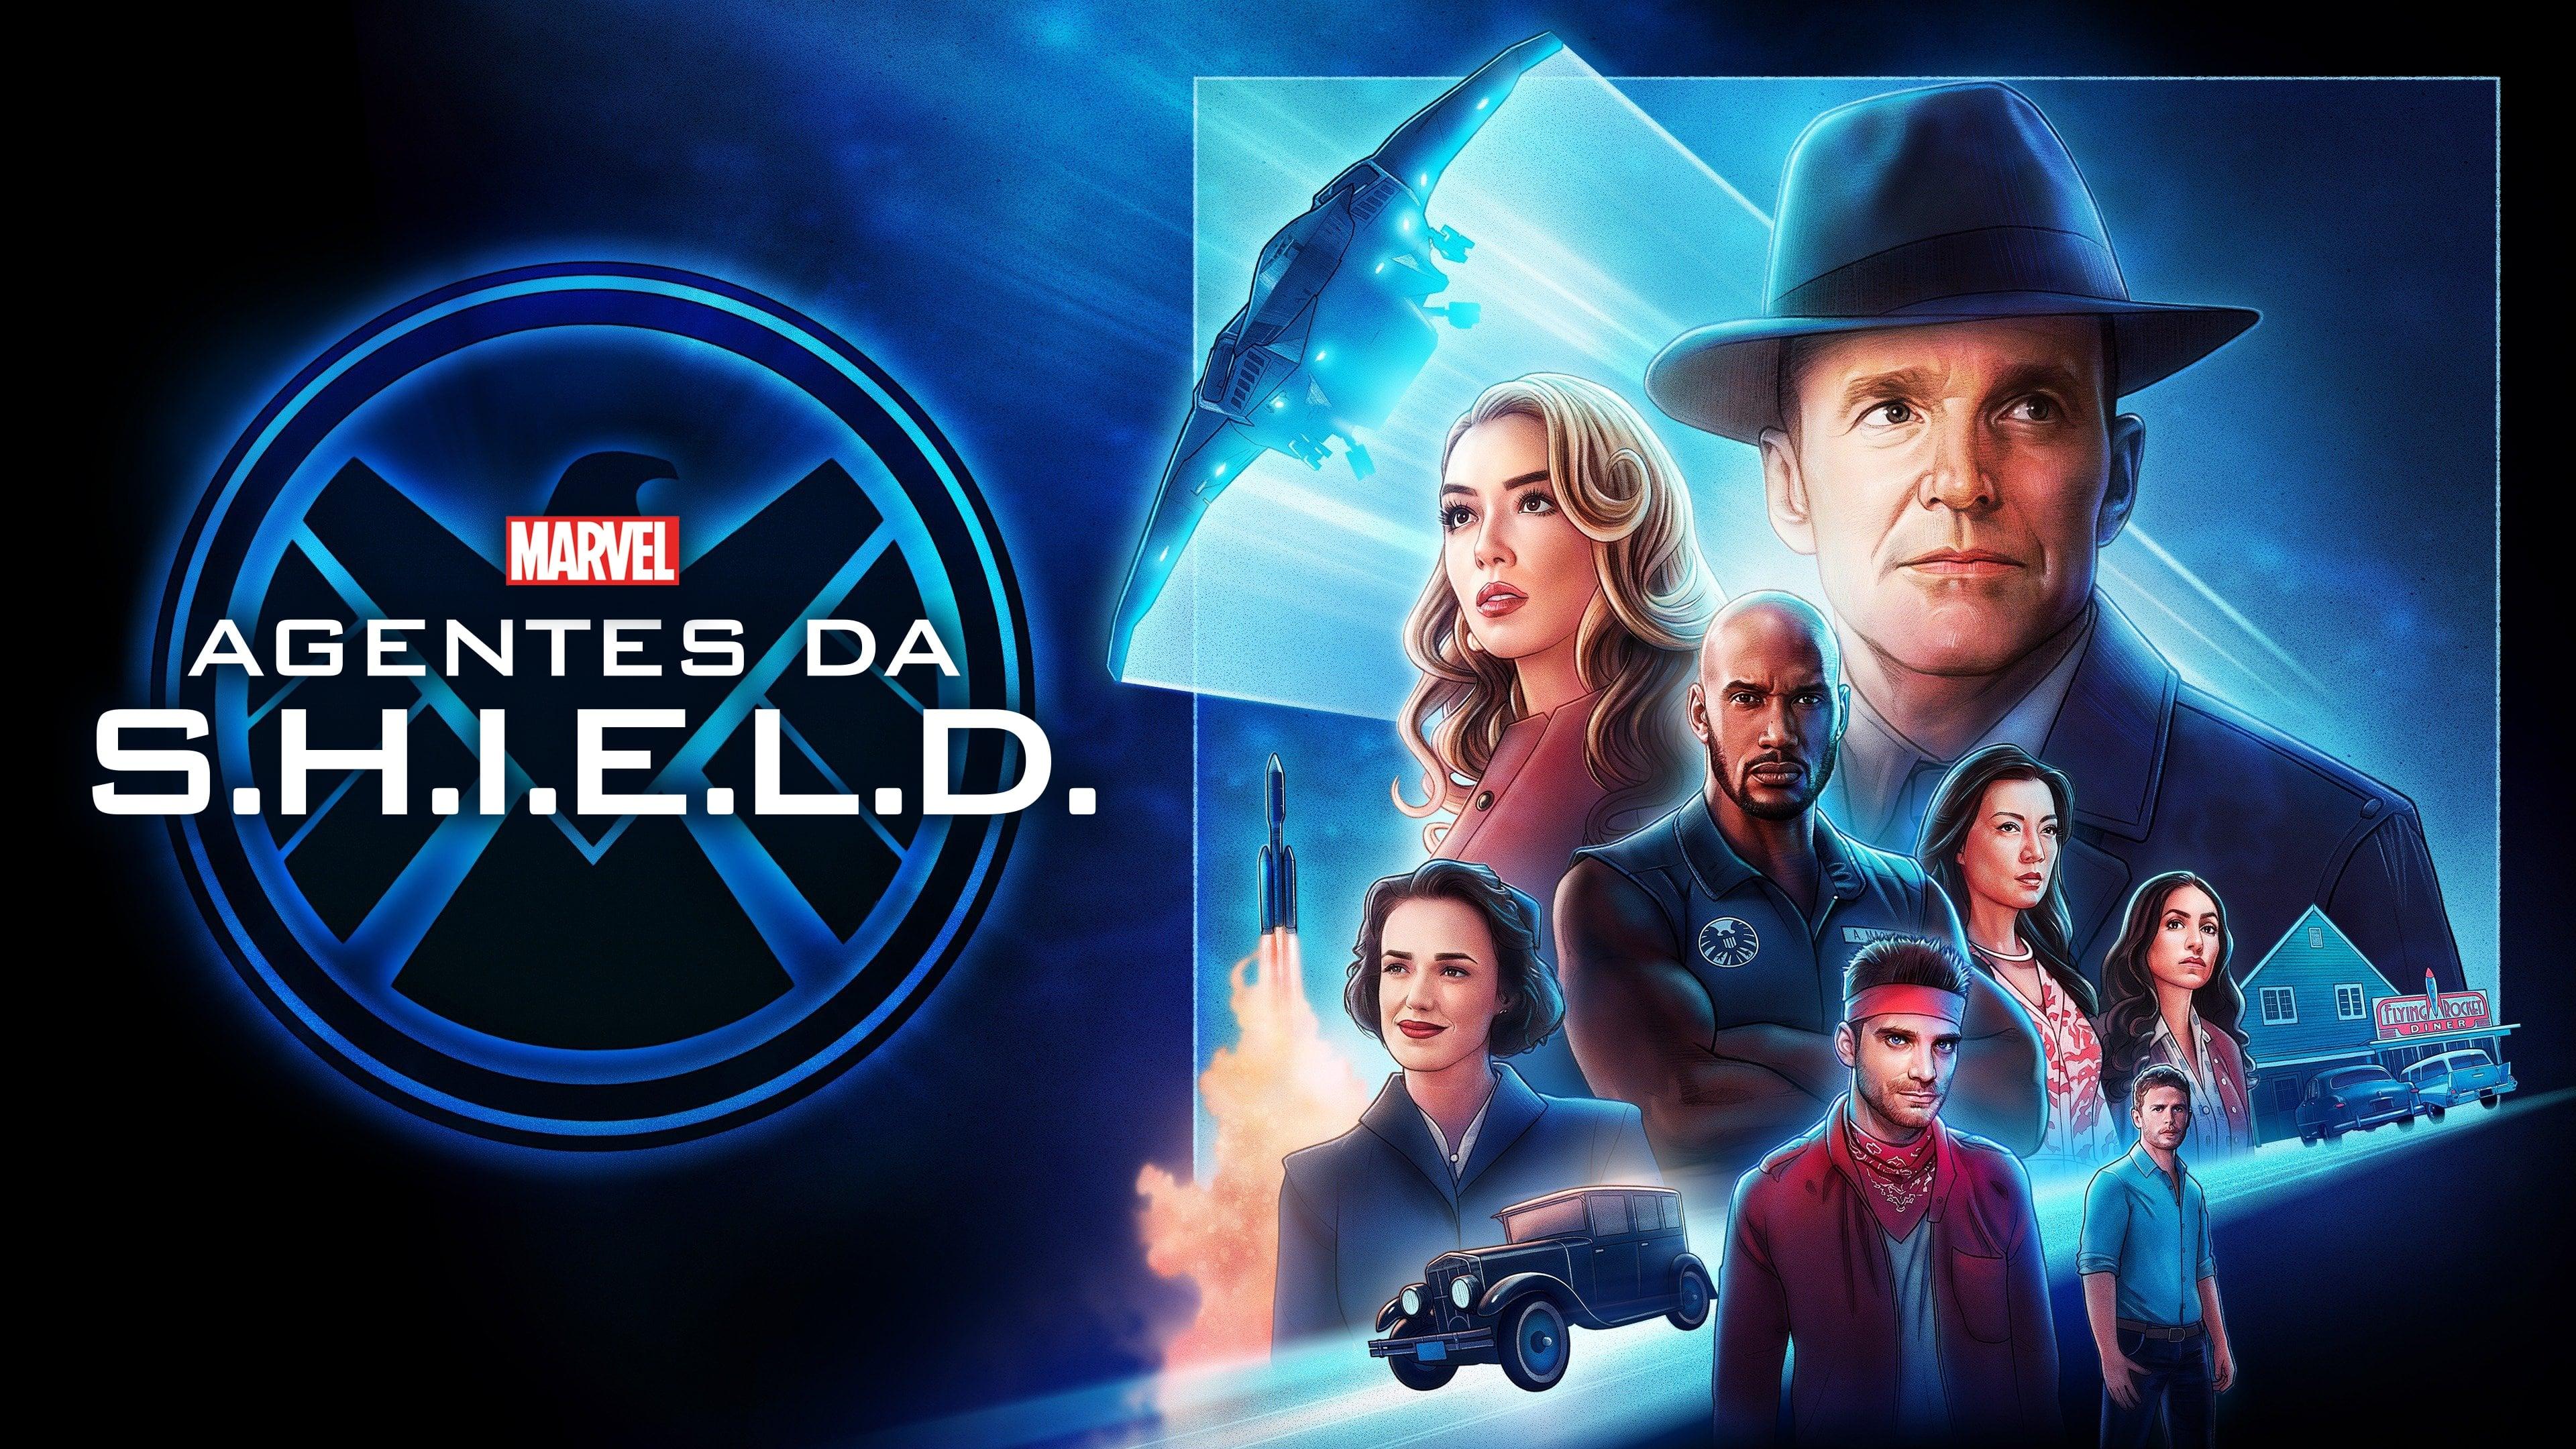 Marvel's Agents of S.H.I.E.L.D. - Season 0 Episode 6 : Double Agent: Post Heist